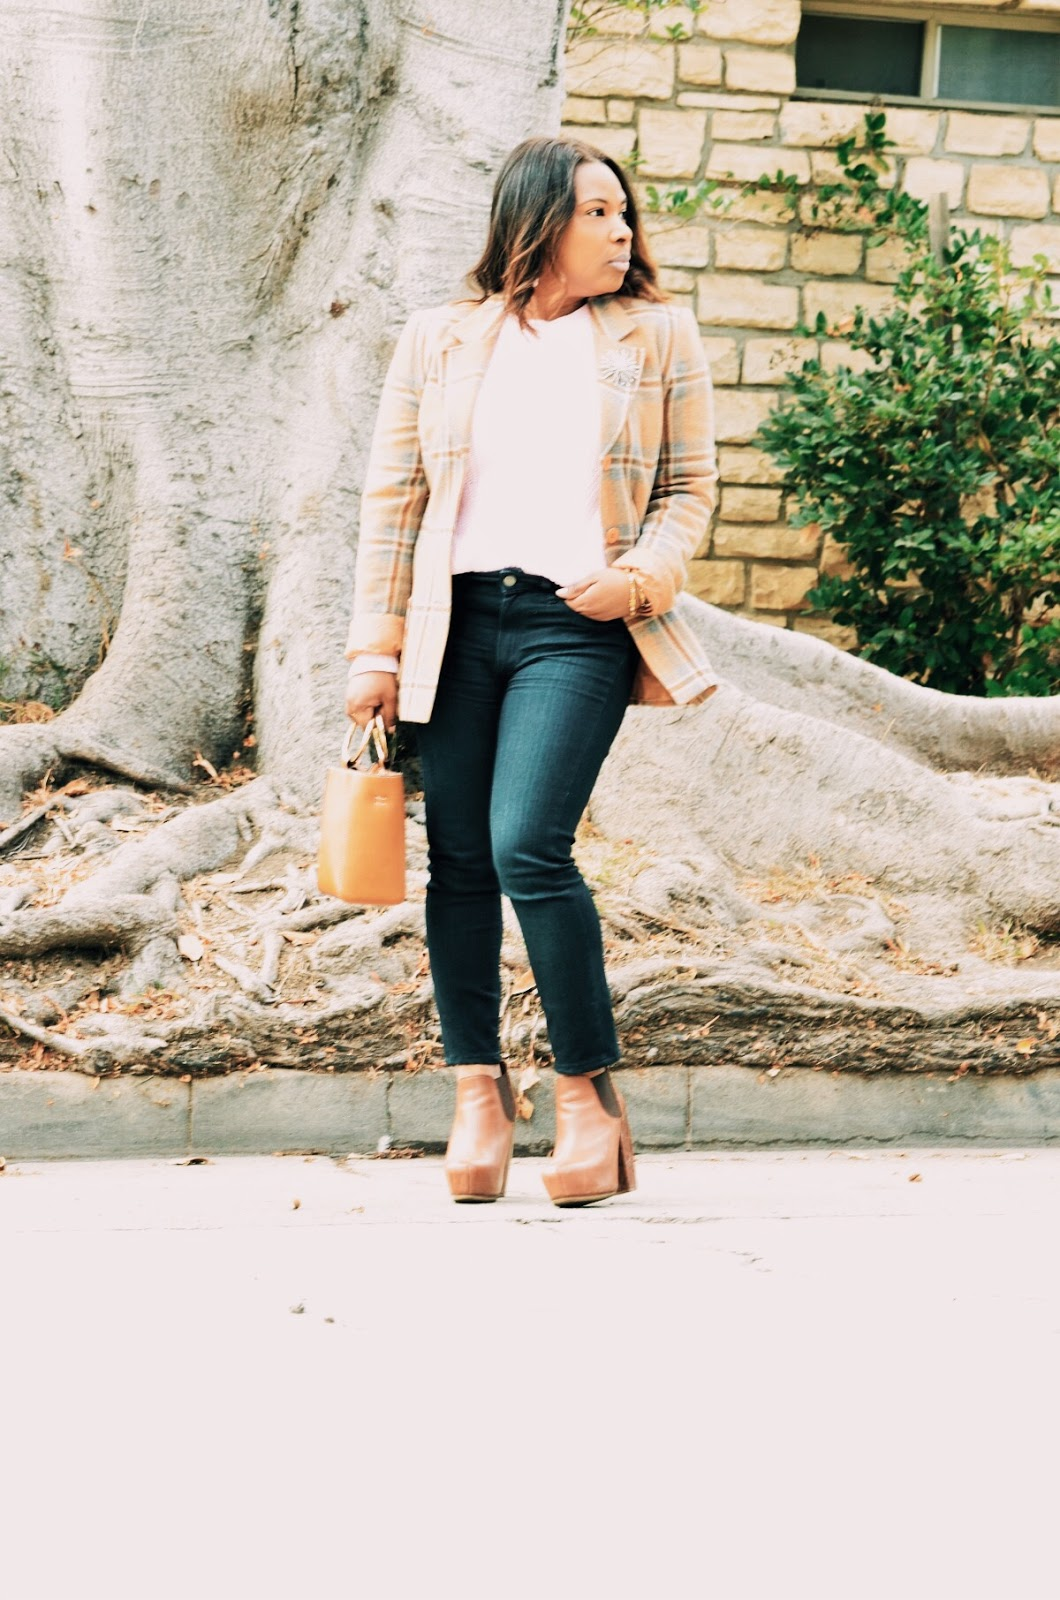 BCBG-Plaid-Jacket-Topshop-Two-tone-tan-ankle-booties-Paige-Denim-Skinny-Jeans-Mango-Crossbody-Mini-Bag-Jacket-Brooch-pin